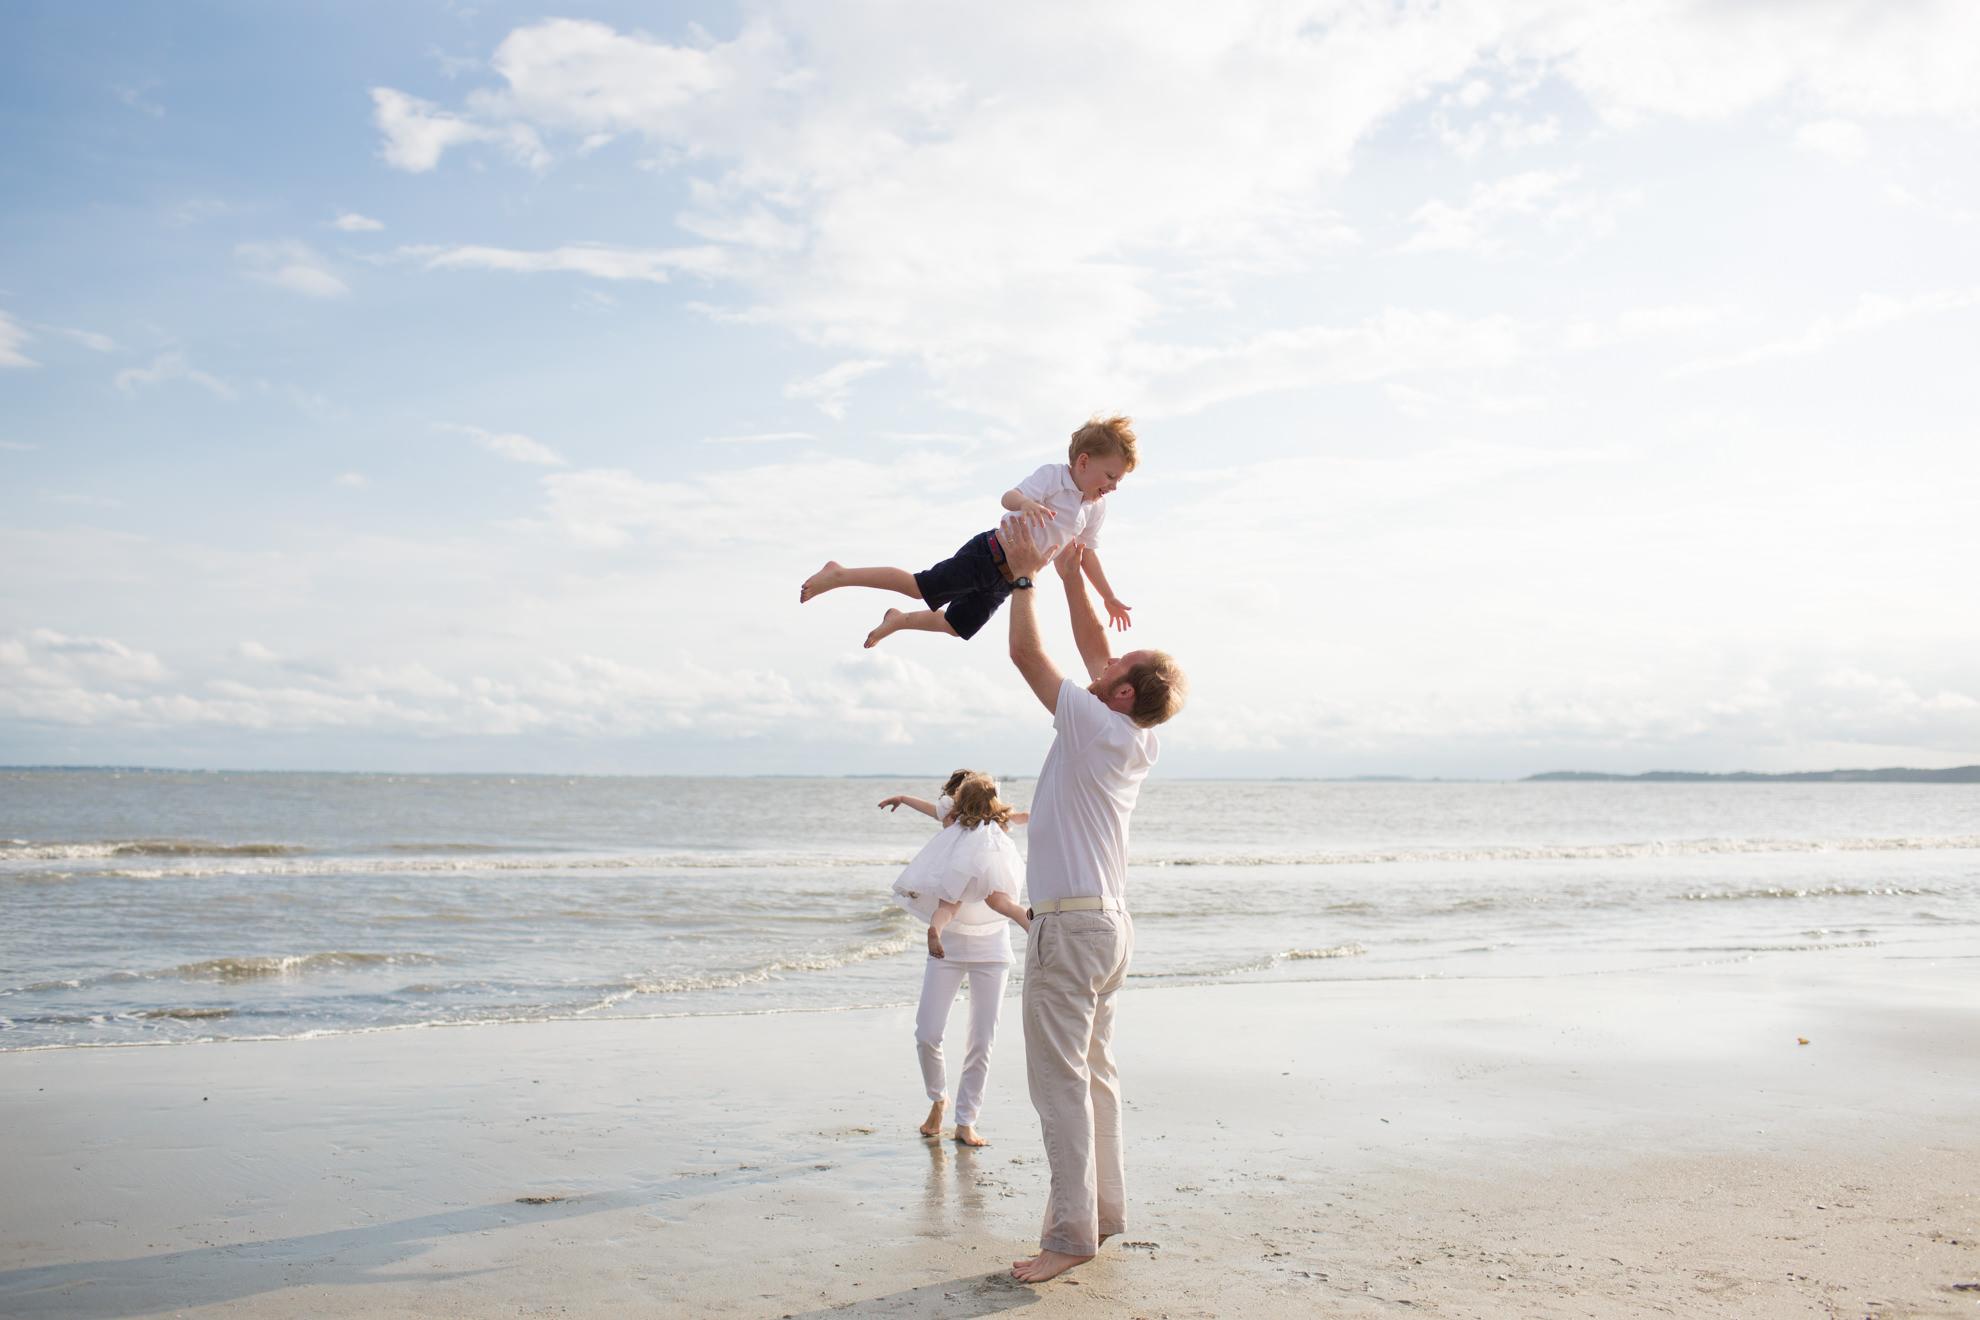 hilton-head-family-vacation-photographer